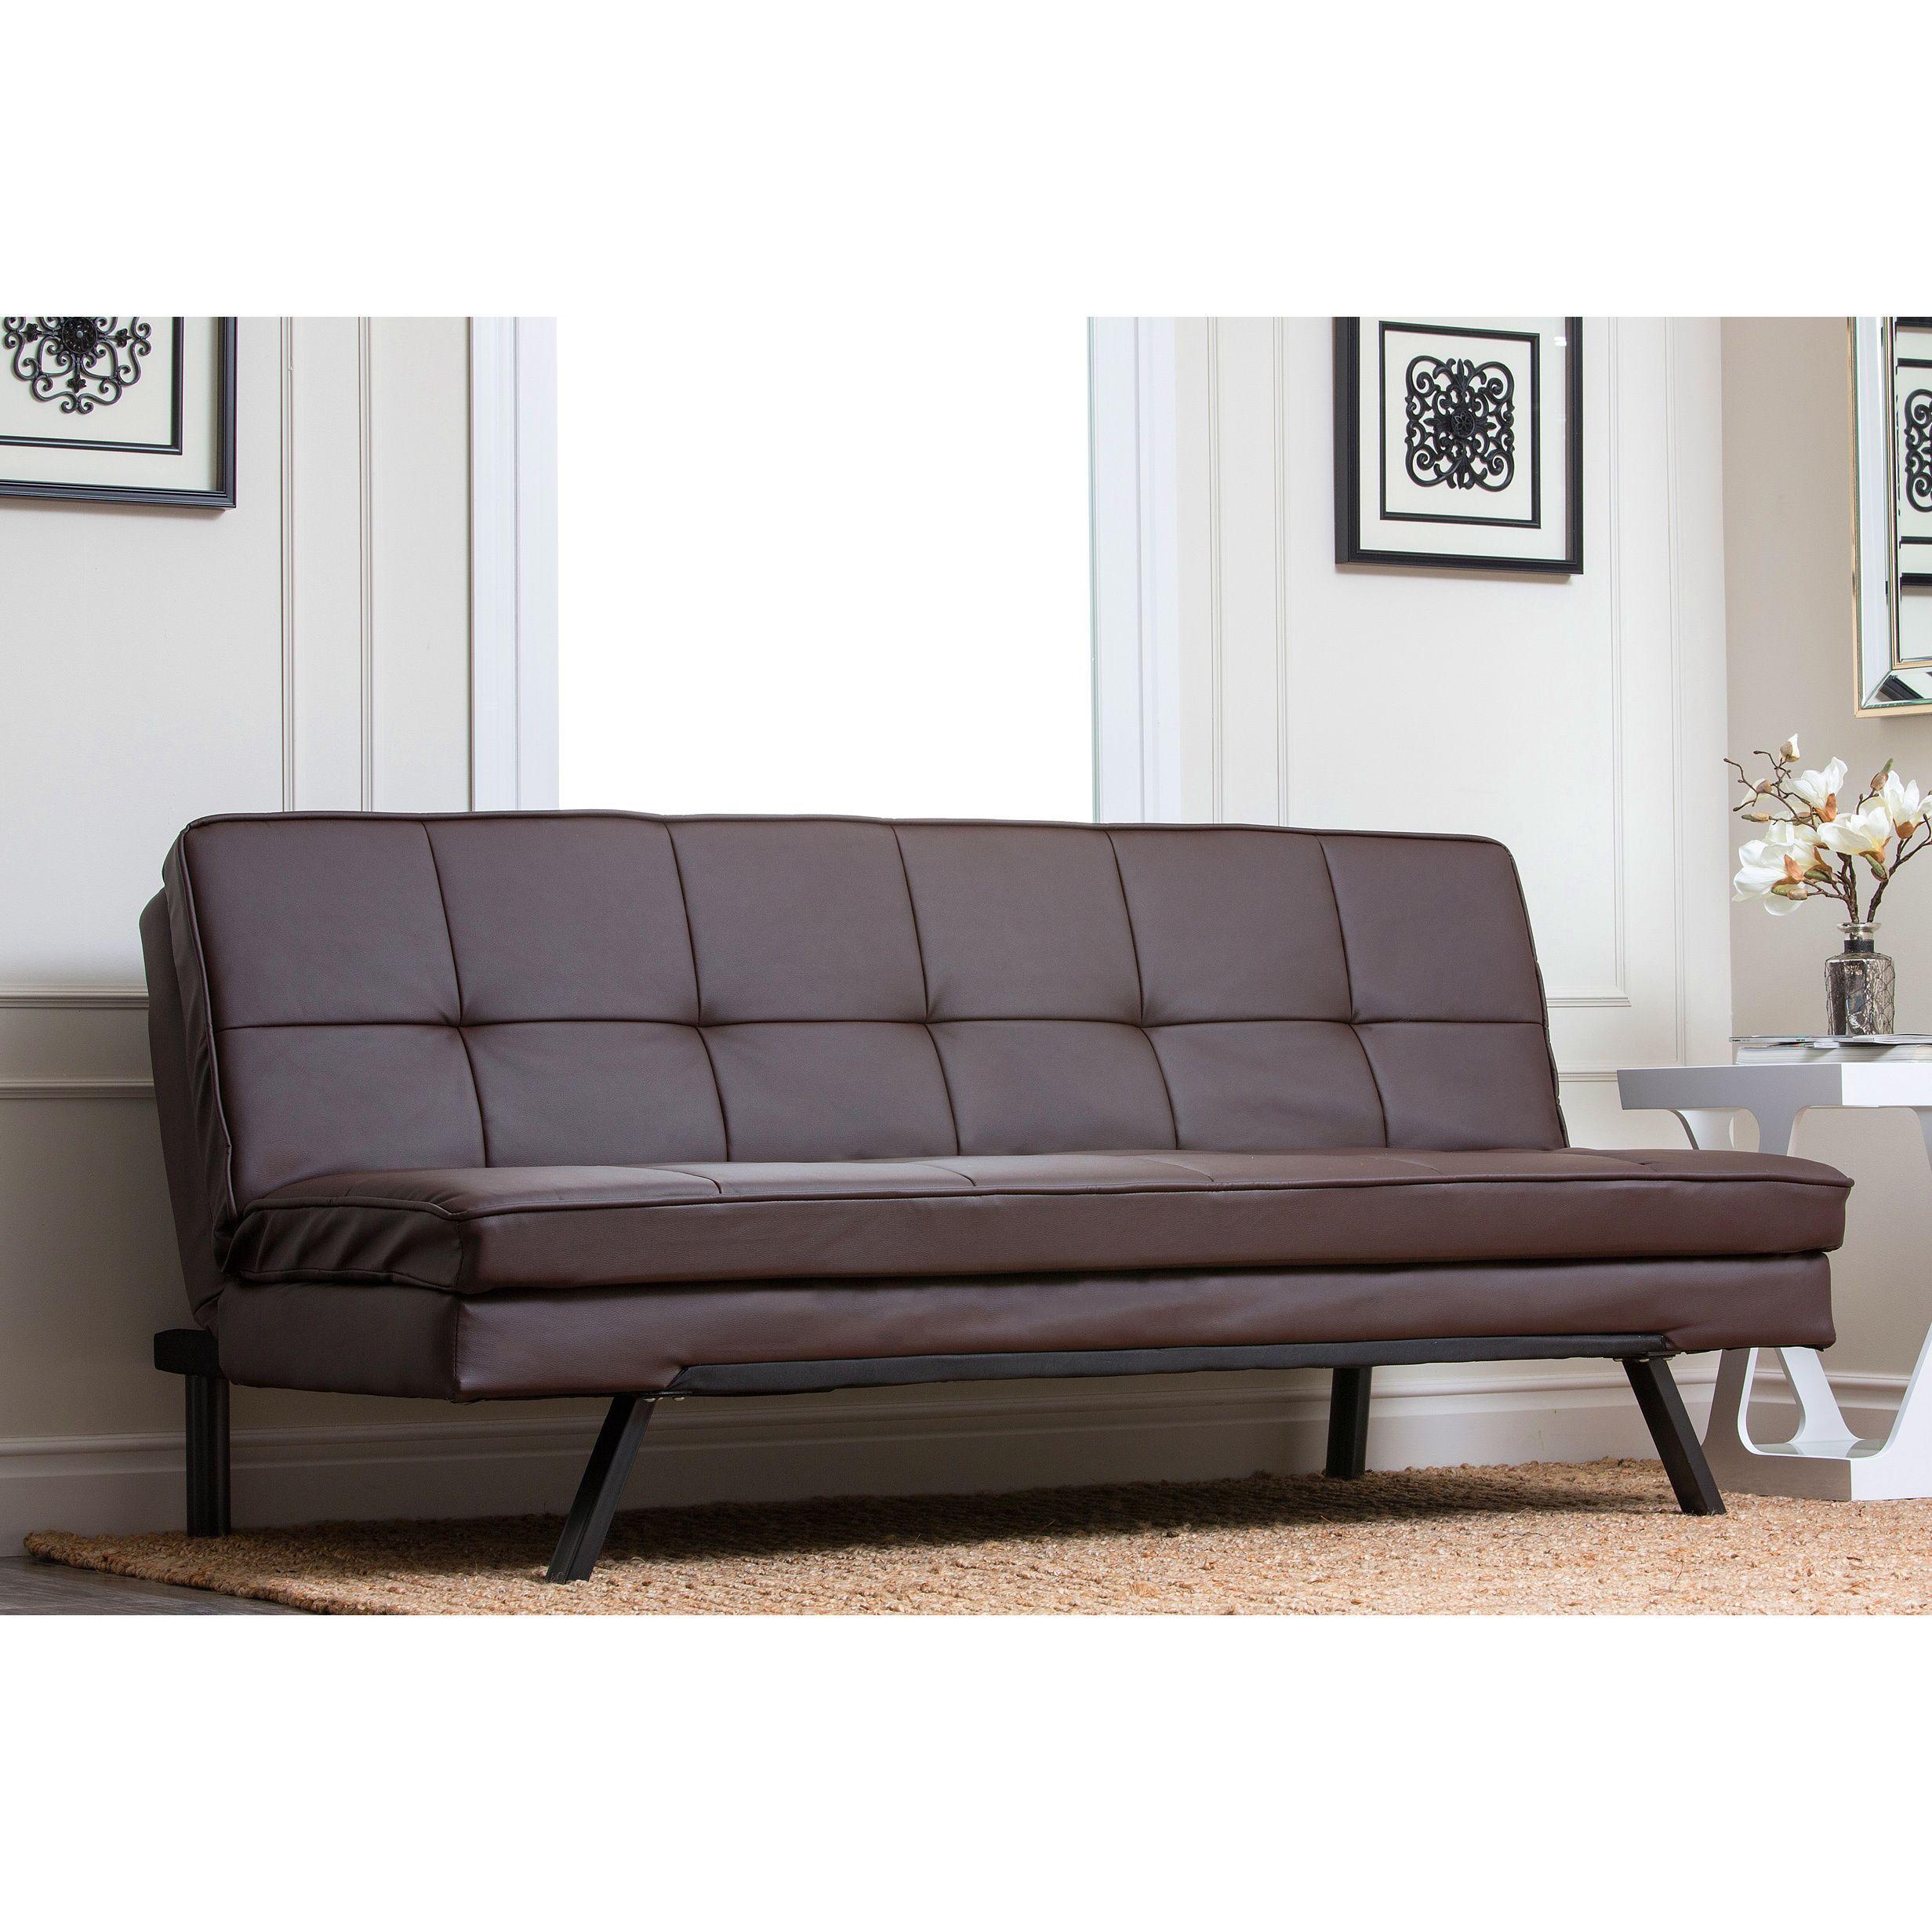 abbyson newport faux leather futon sleeper sofa by abbyson futon